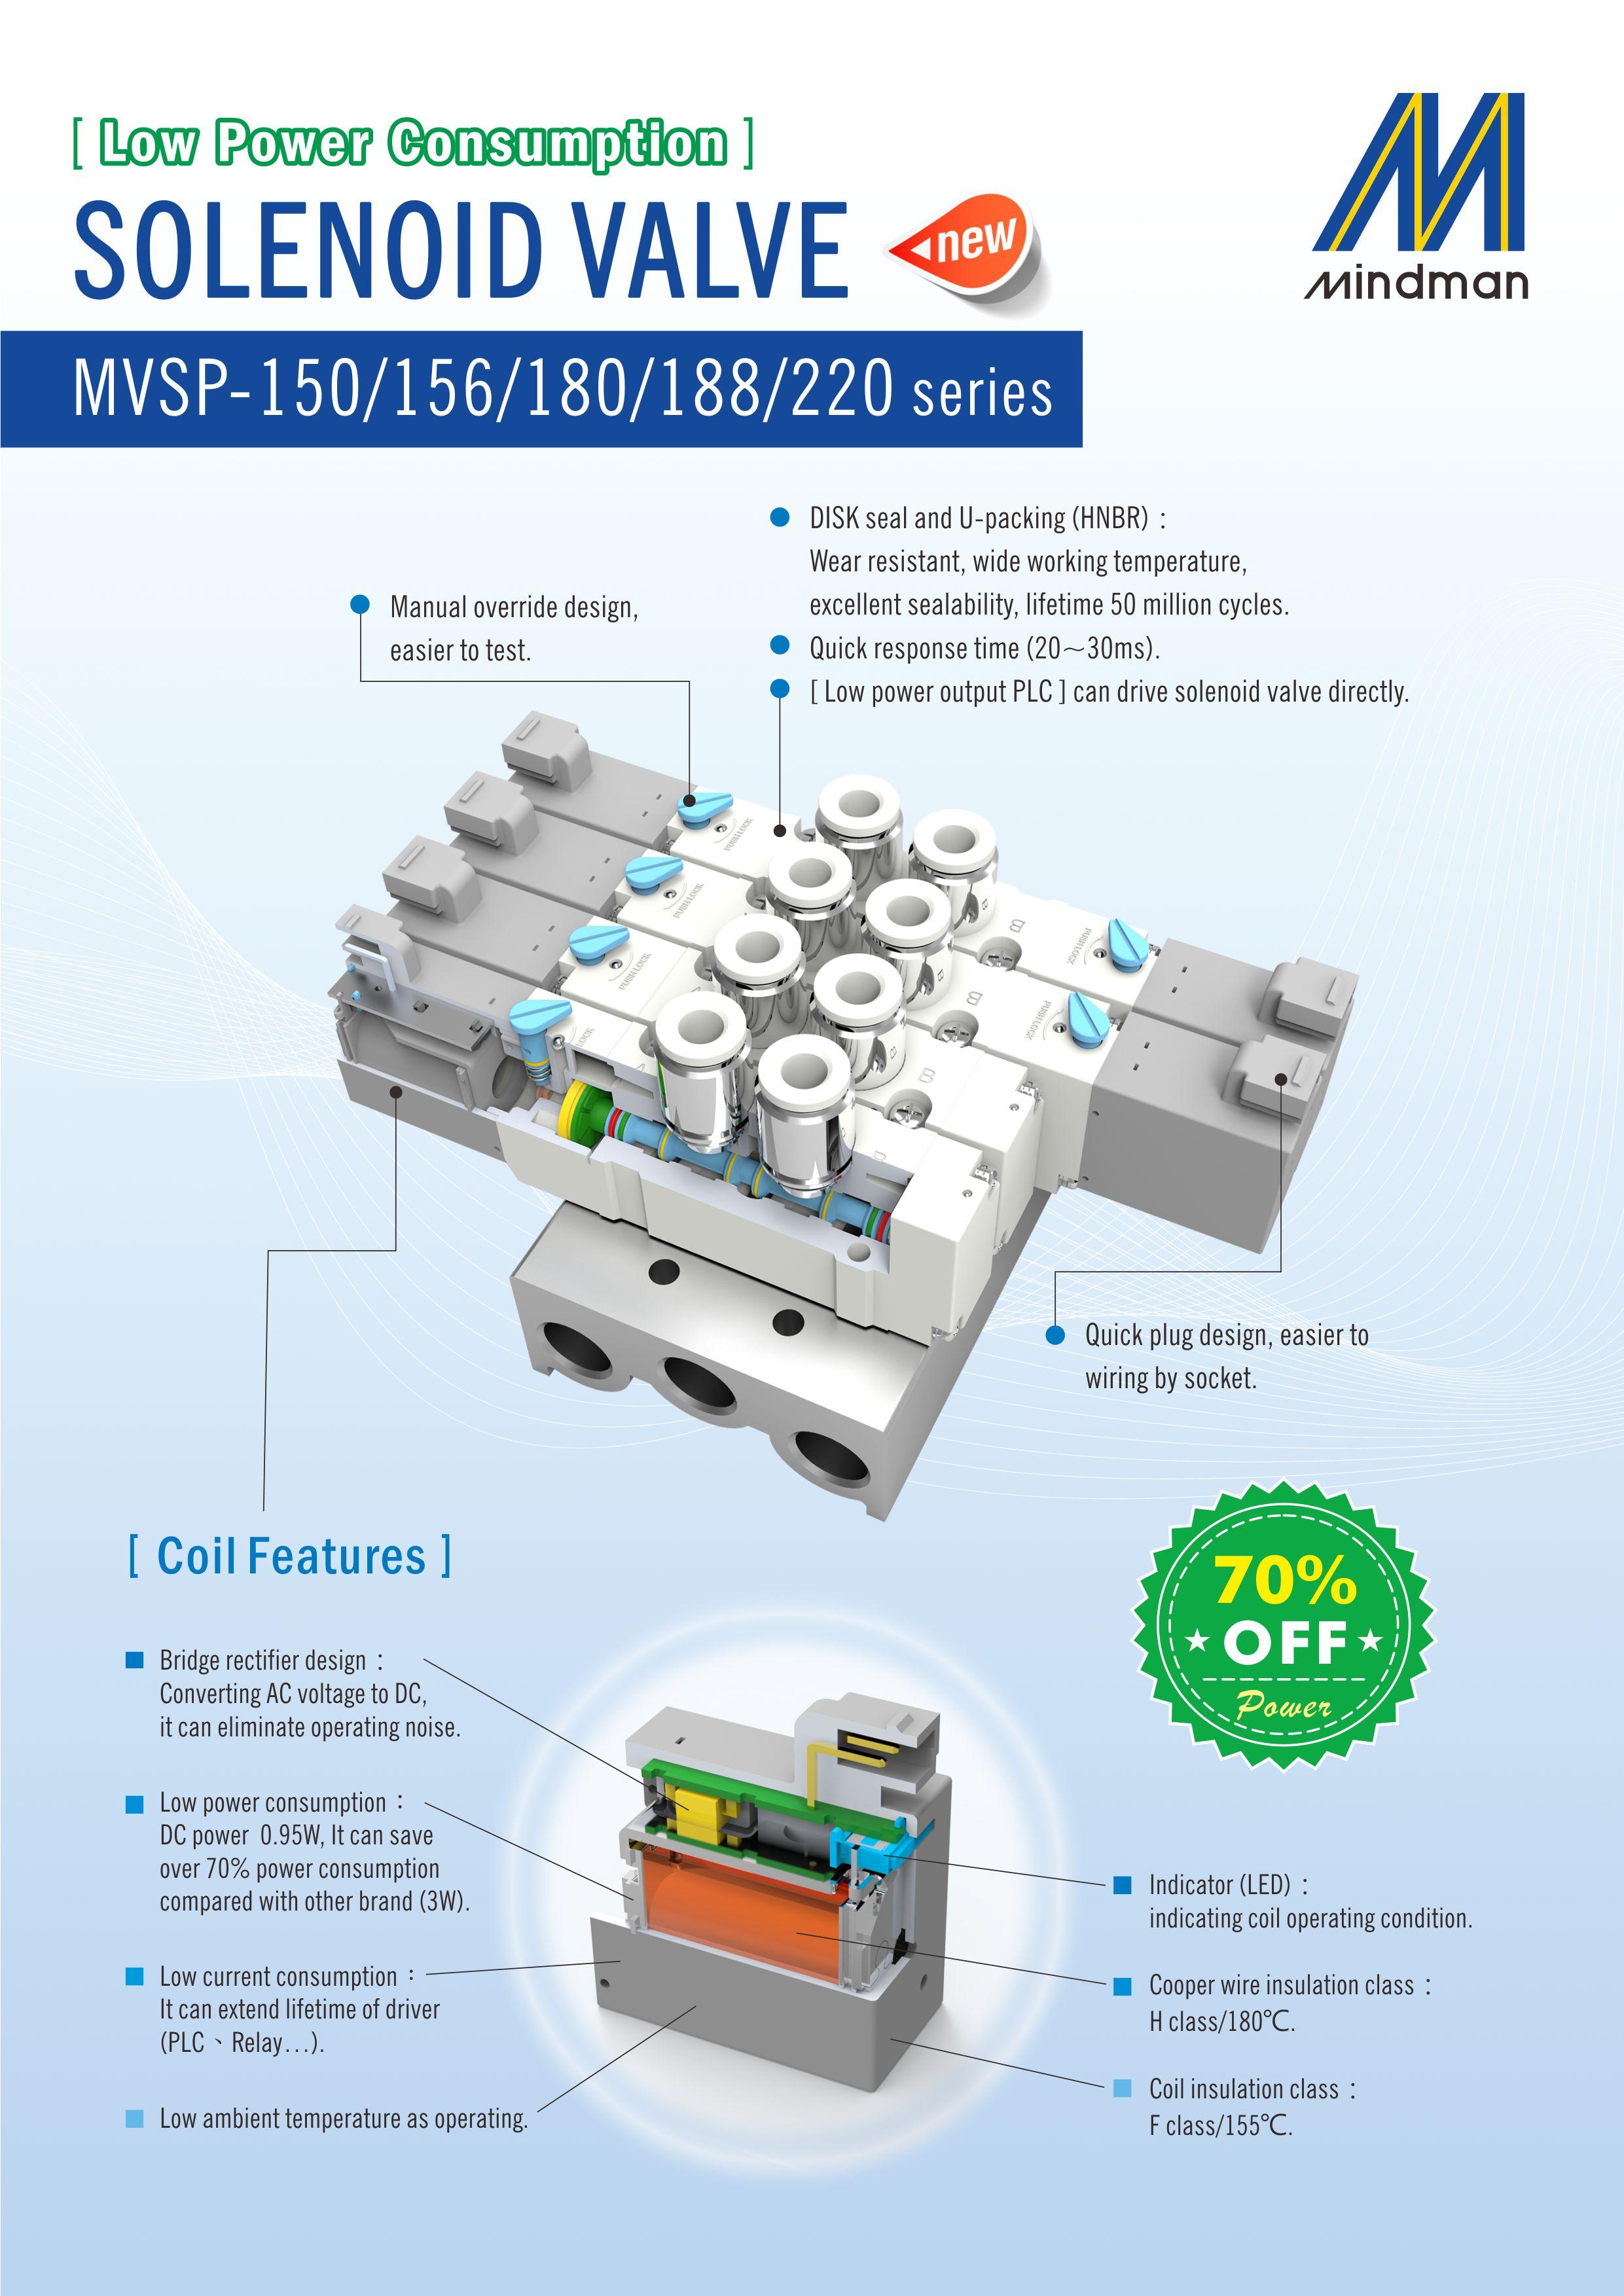 Solenoid valve MVSP